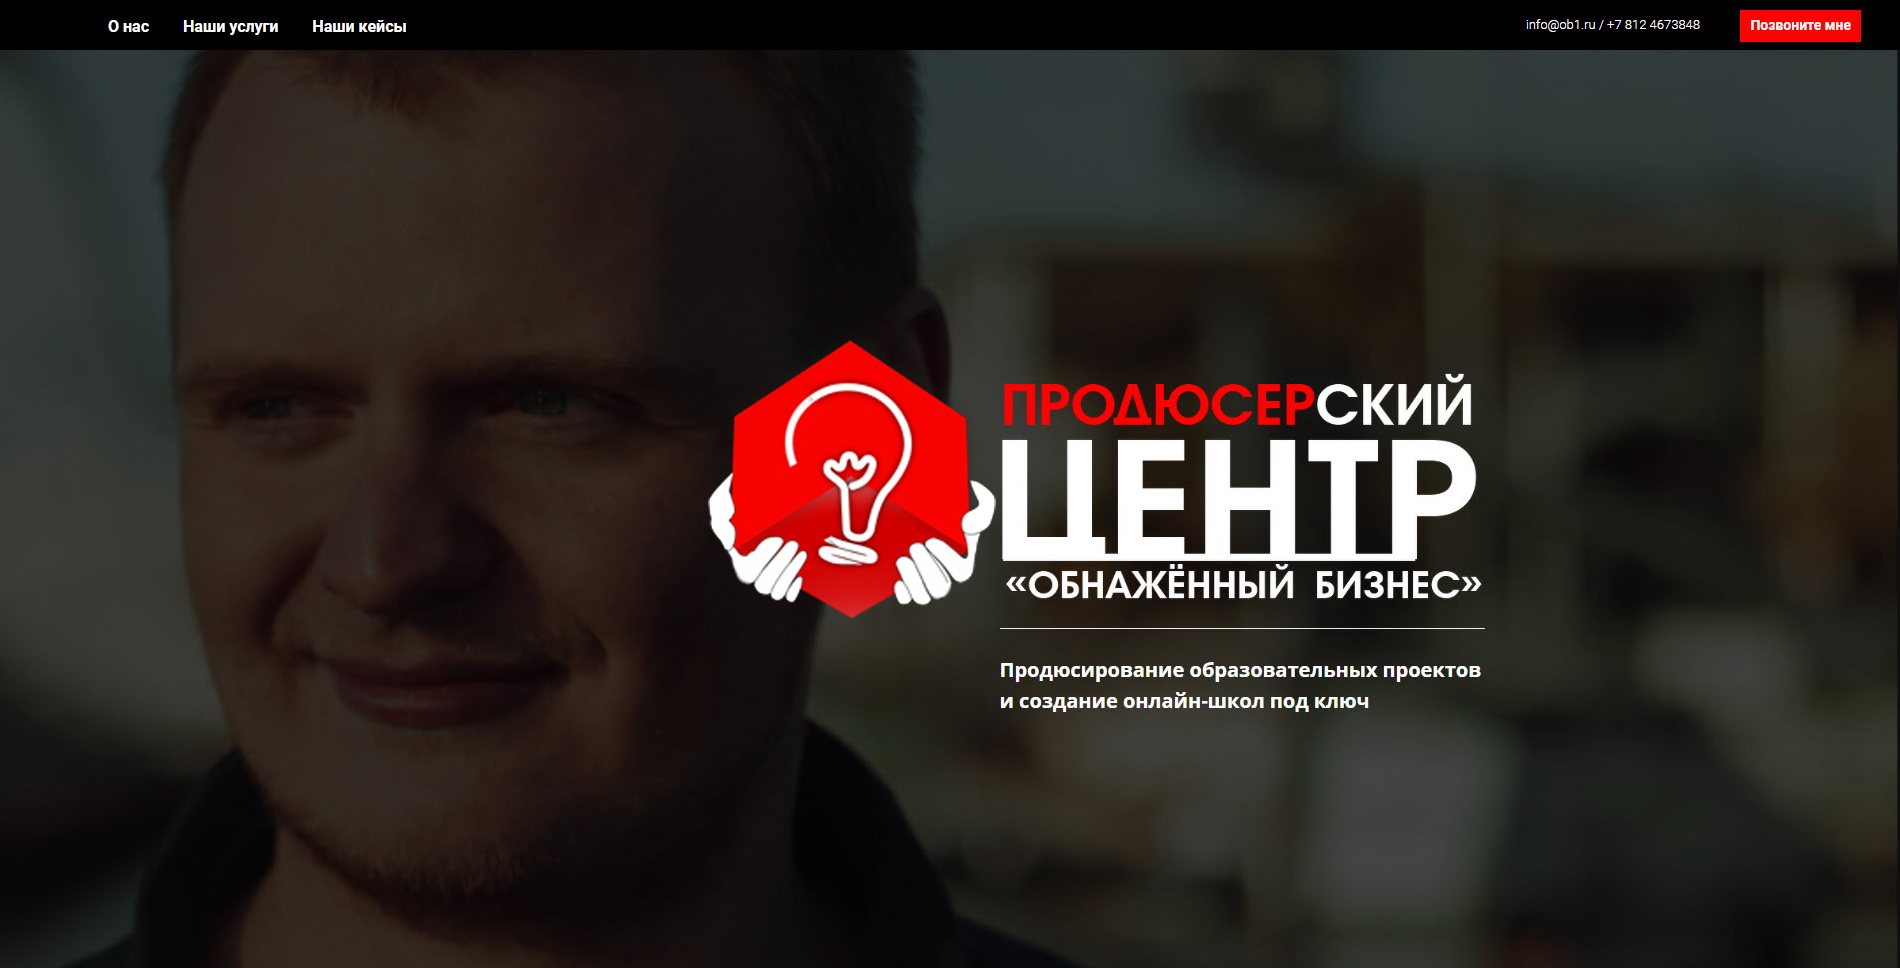 "Логотип для продюсерского центра ""Обнажённый бизнес"" фото f_2985ba55ae356a6d.jpg"